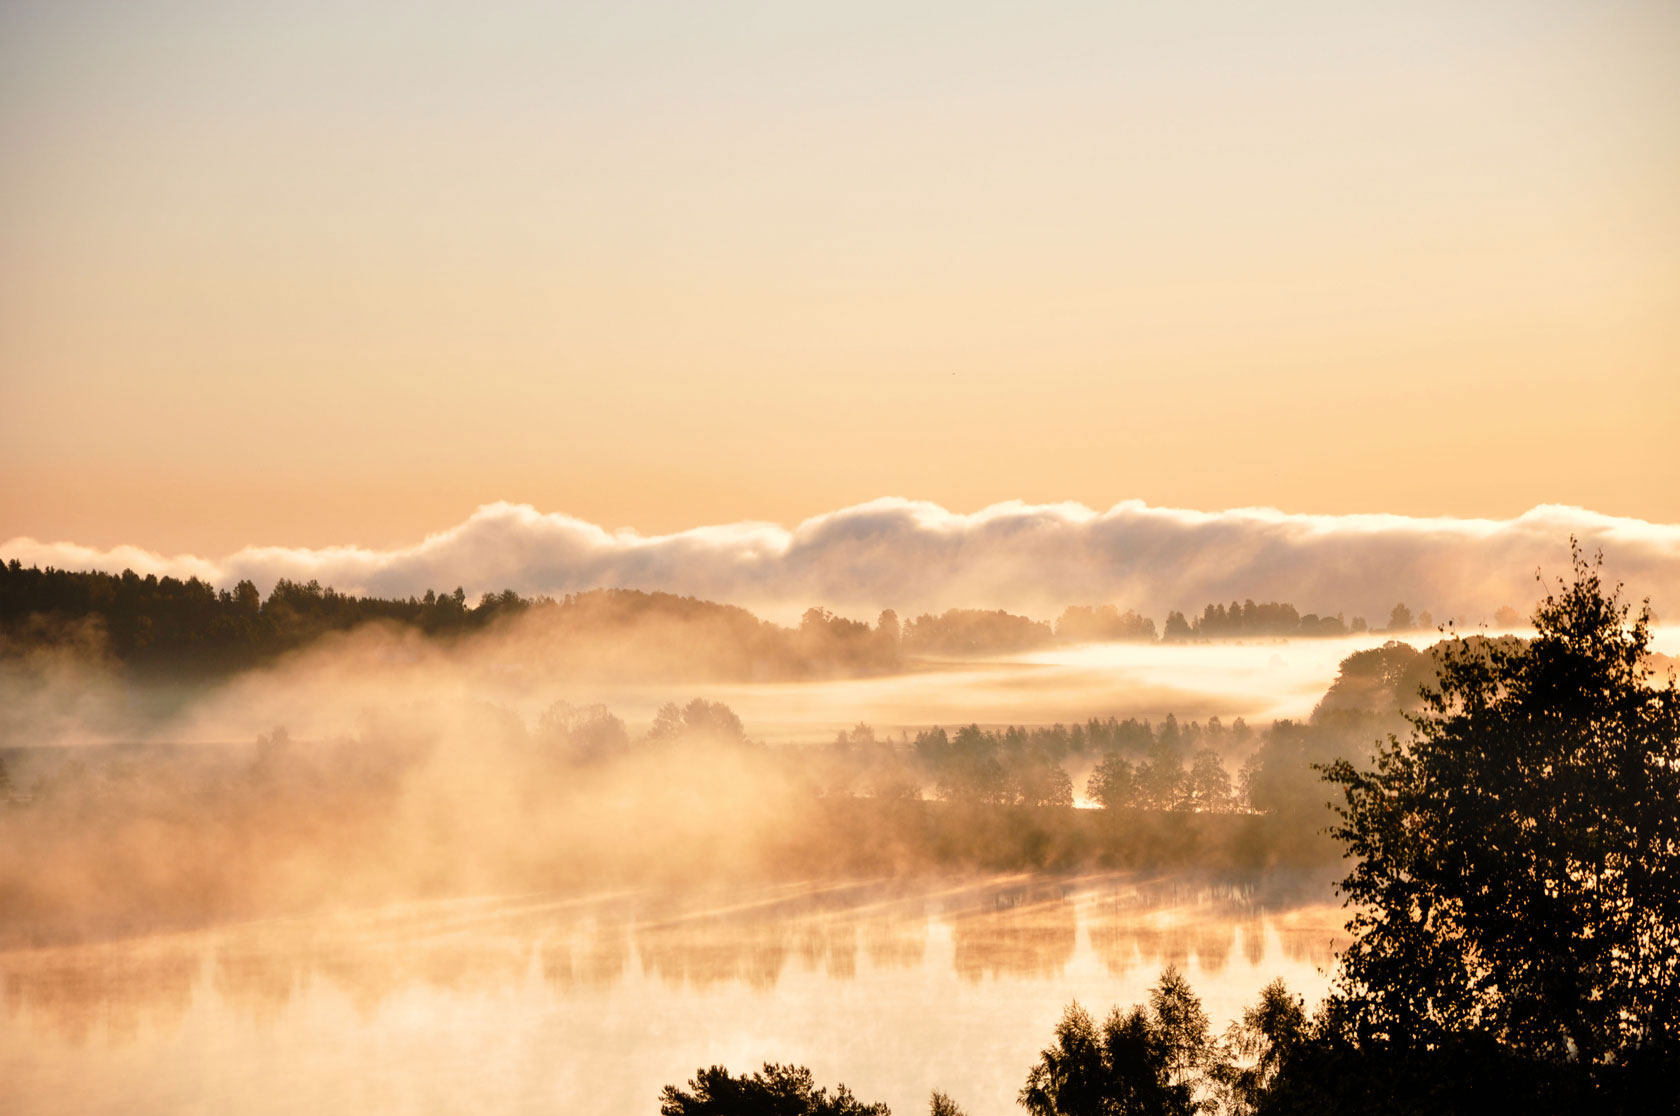 Morgonstund - ©2011 Linda Åslund